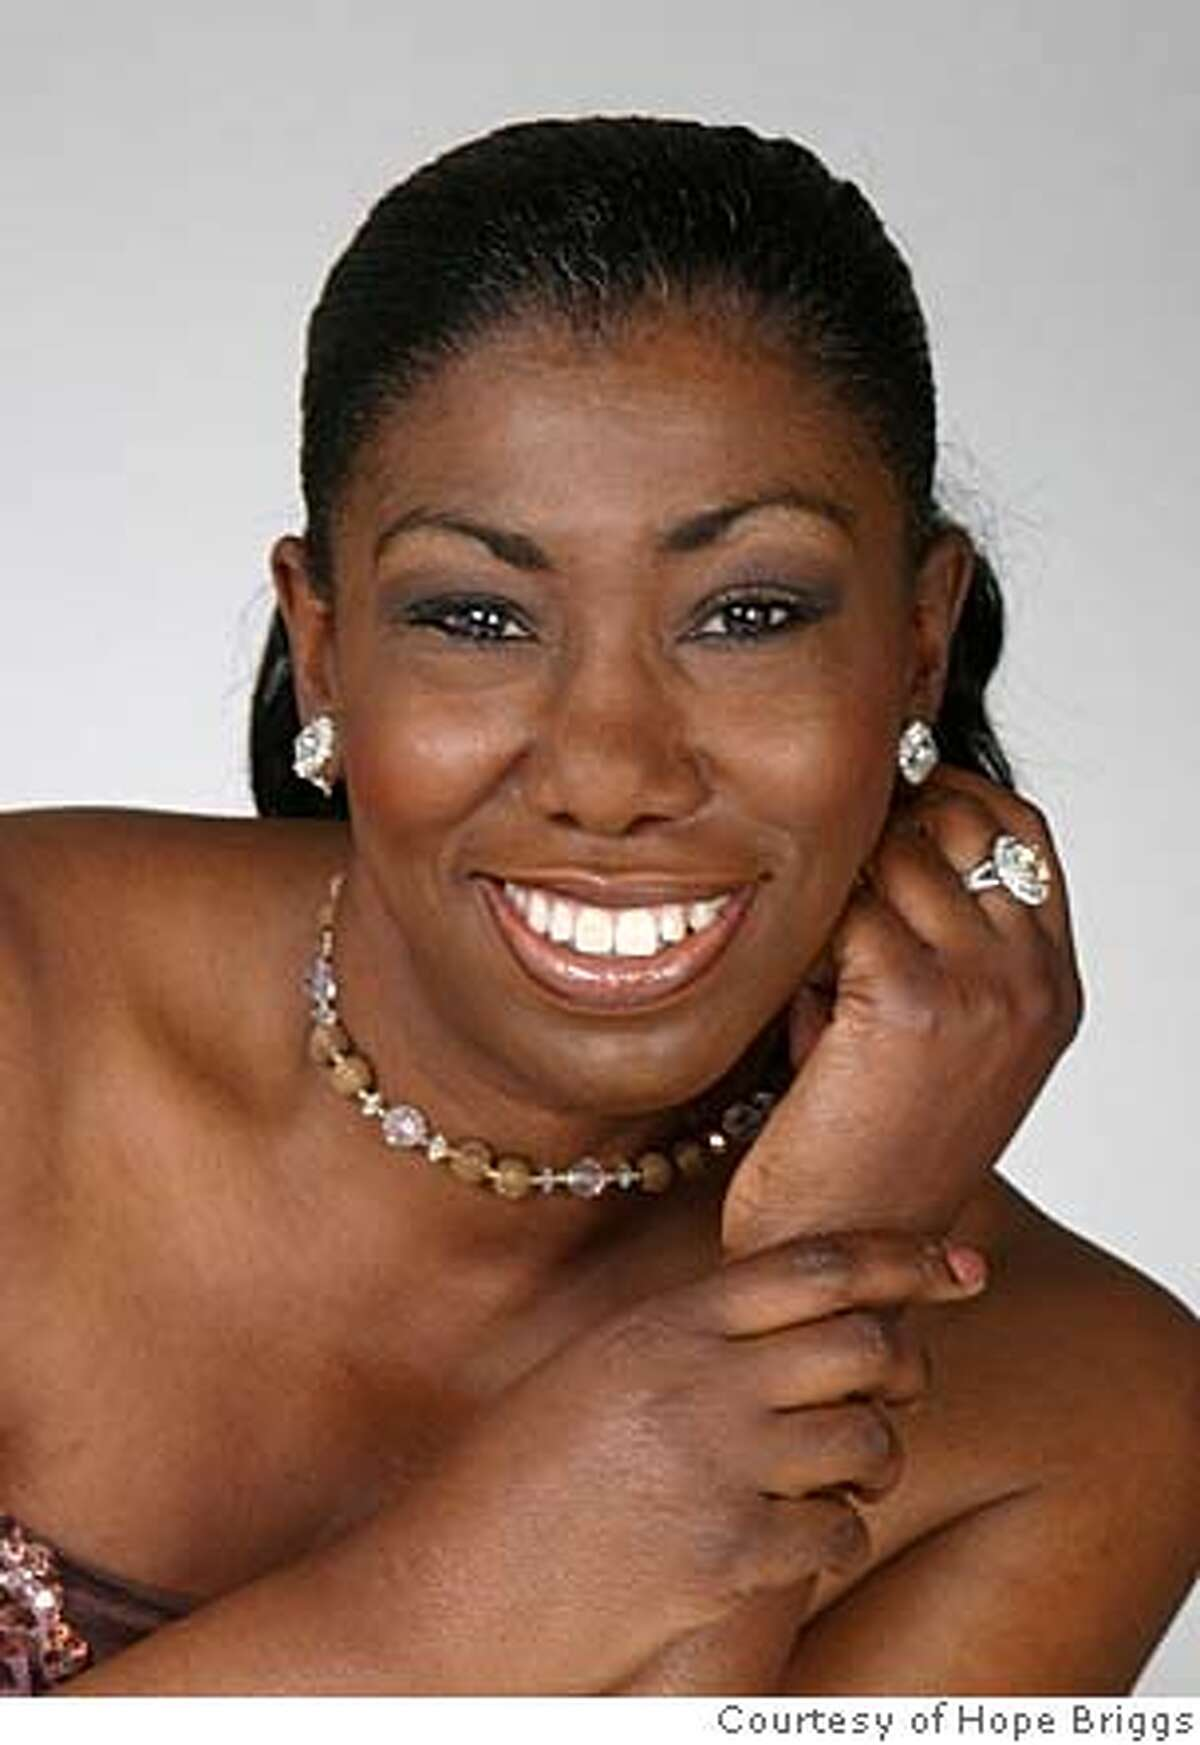 Singer Hope Briggs